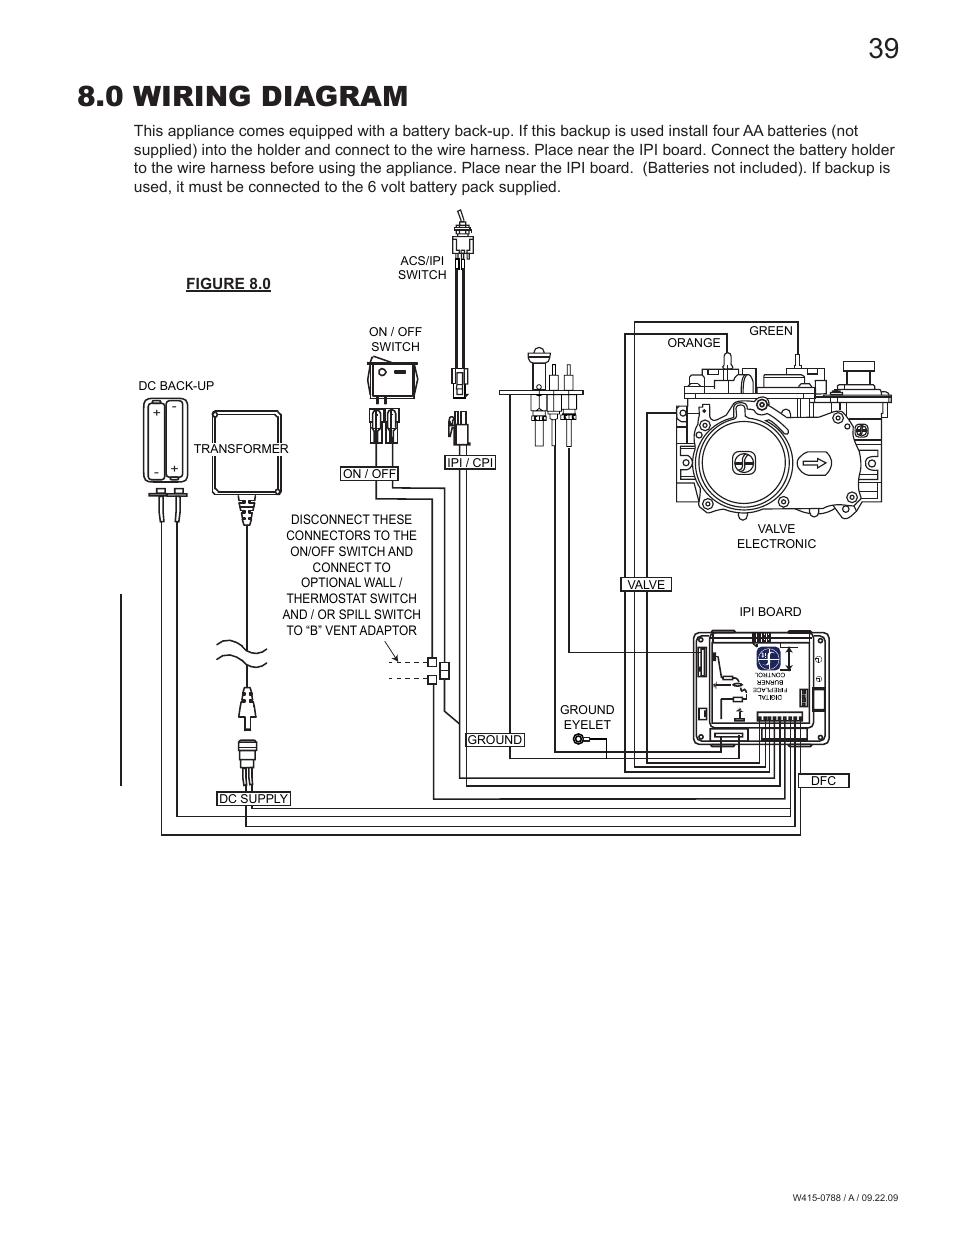 Mccormick Xtx 185 Wire Diagram Mercedes-benz Fuse Diagram For 1989 ...